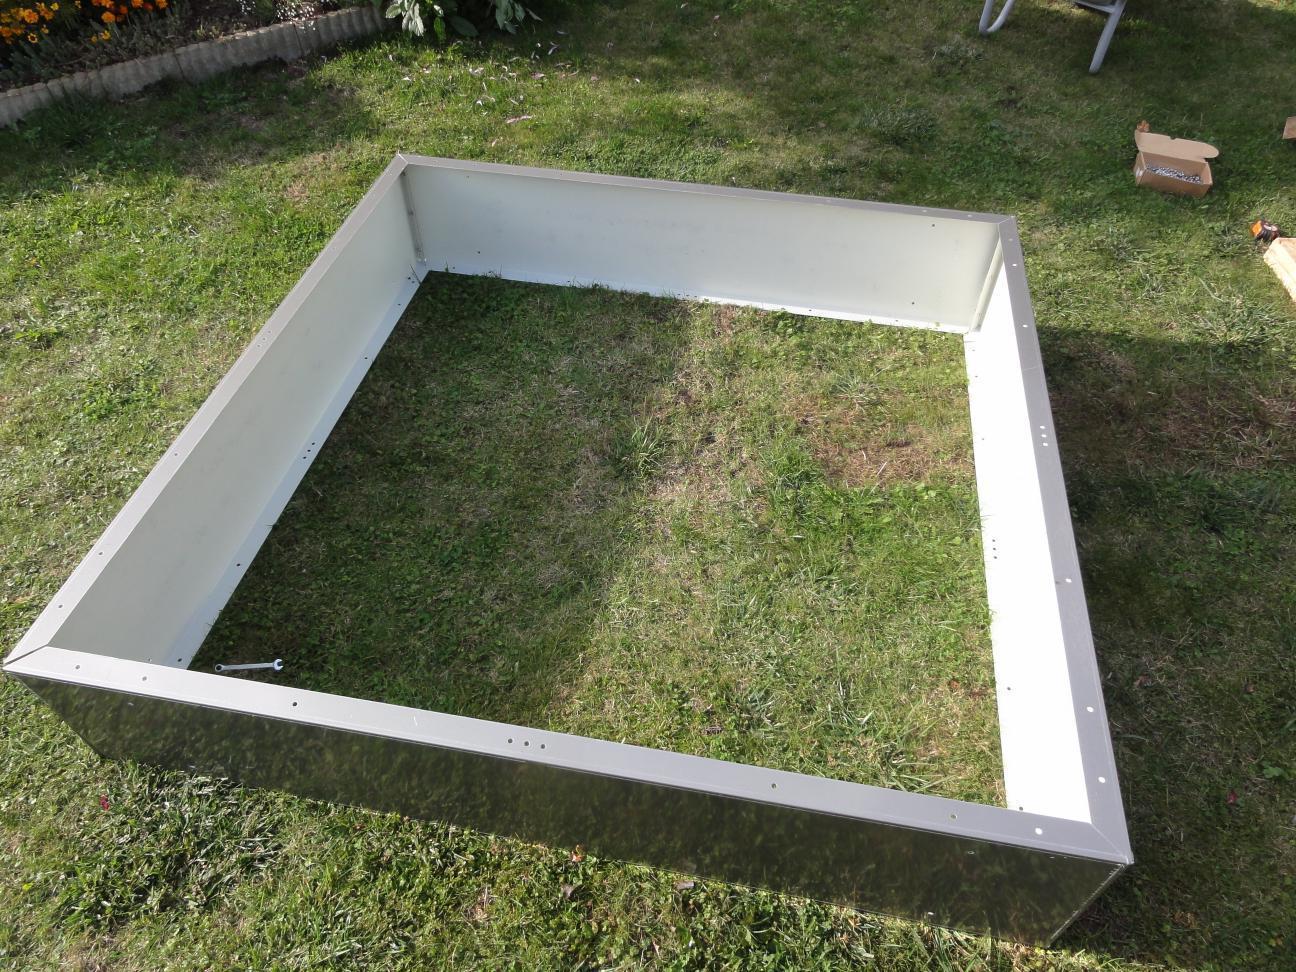 kaminholzregal metall 1 7 m x 1 5 m lackiert. Black Bedroom Furniture Sets. Home Design Ideas